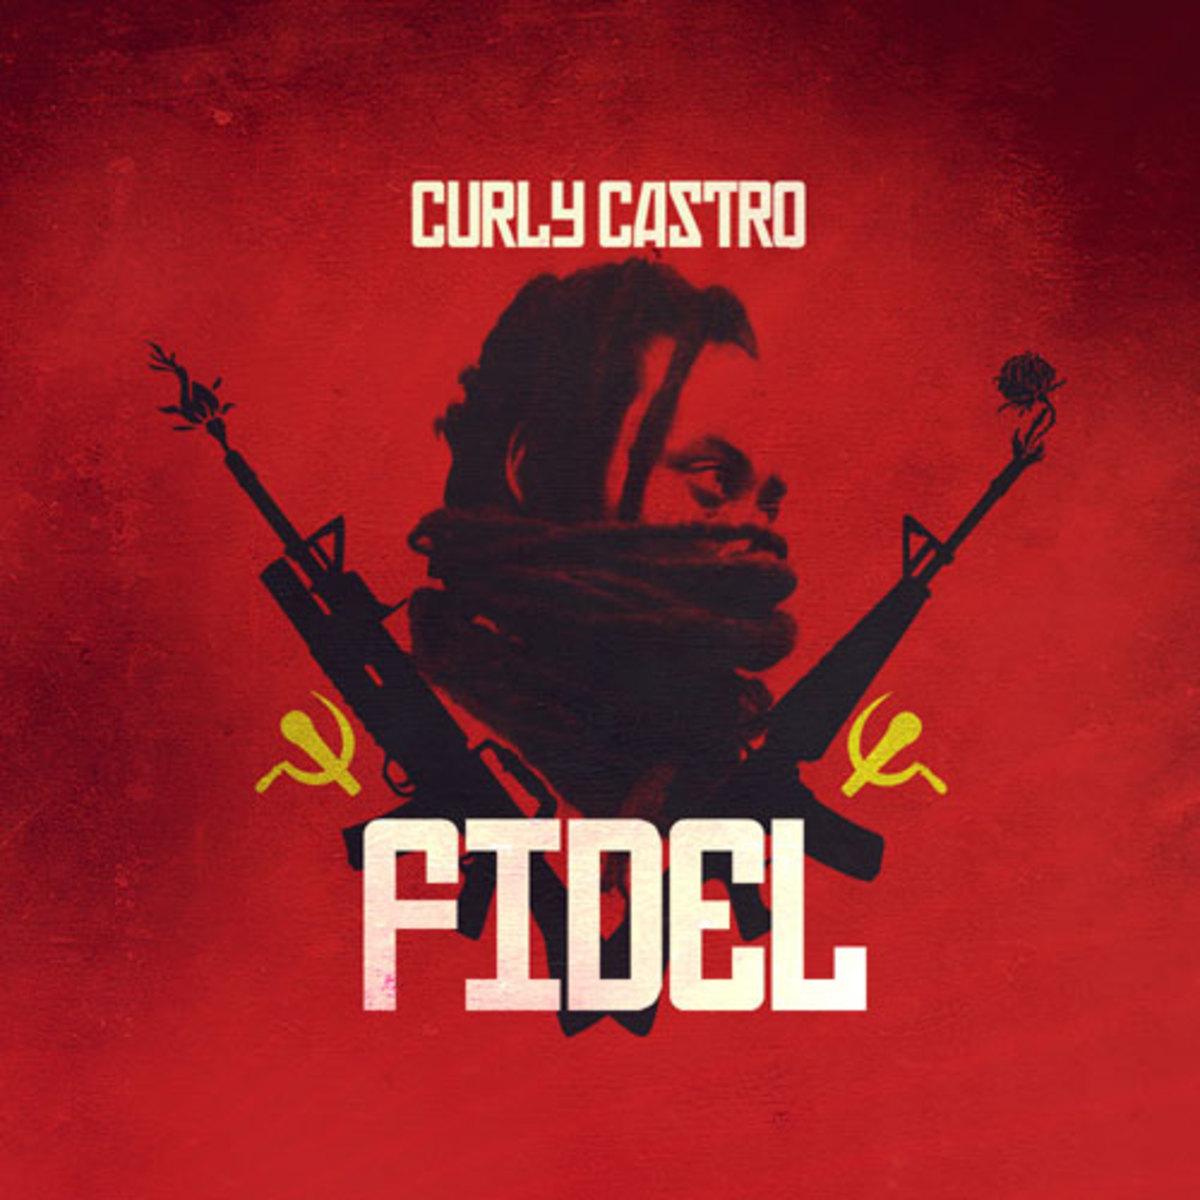 curlycastro-fidel.jpg